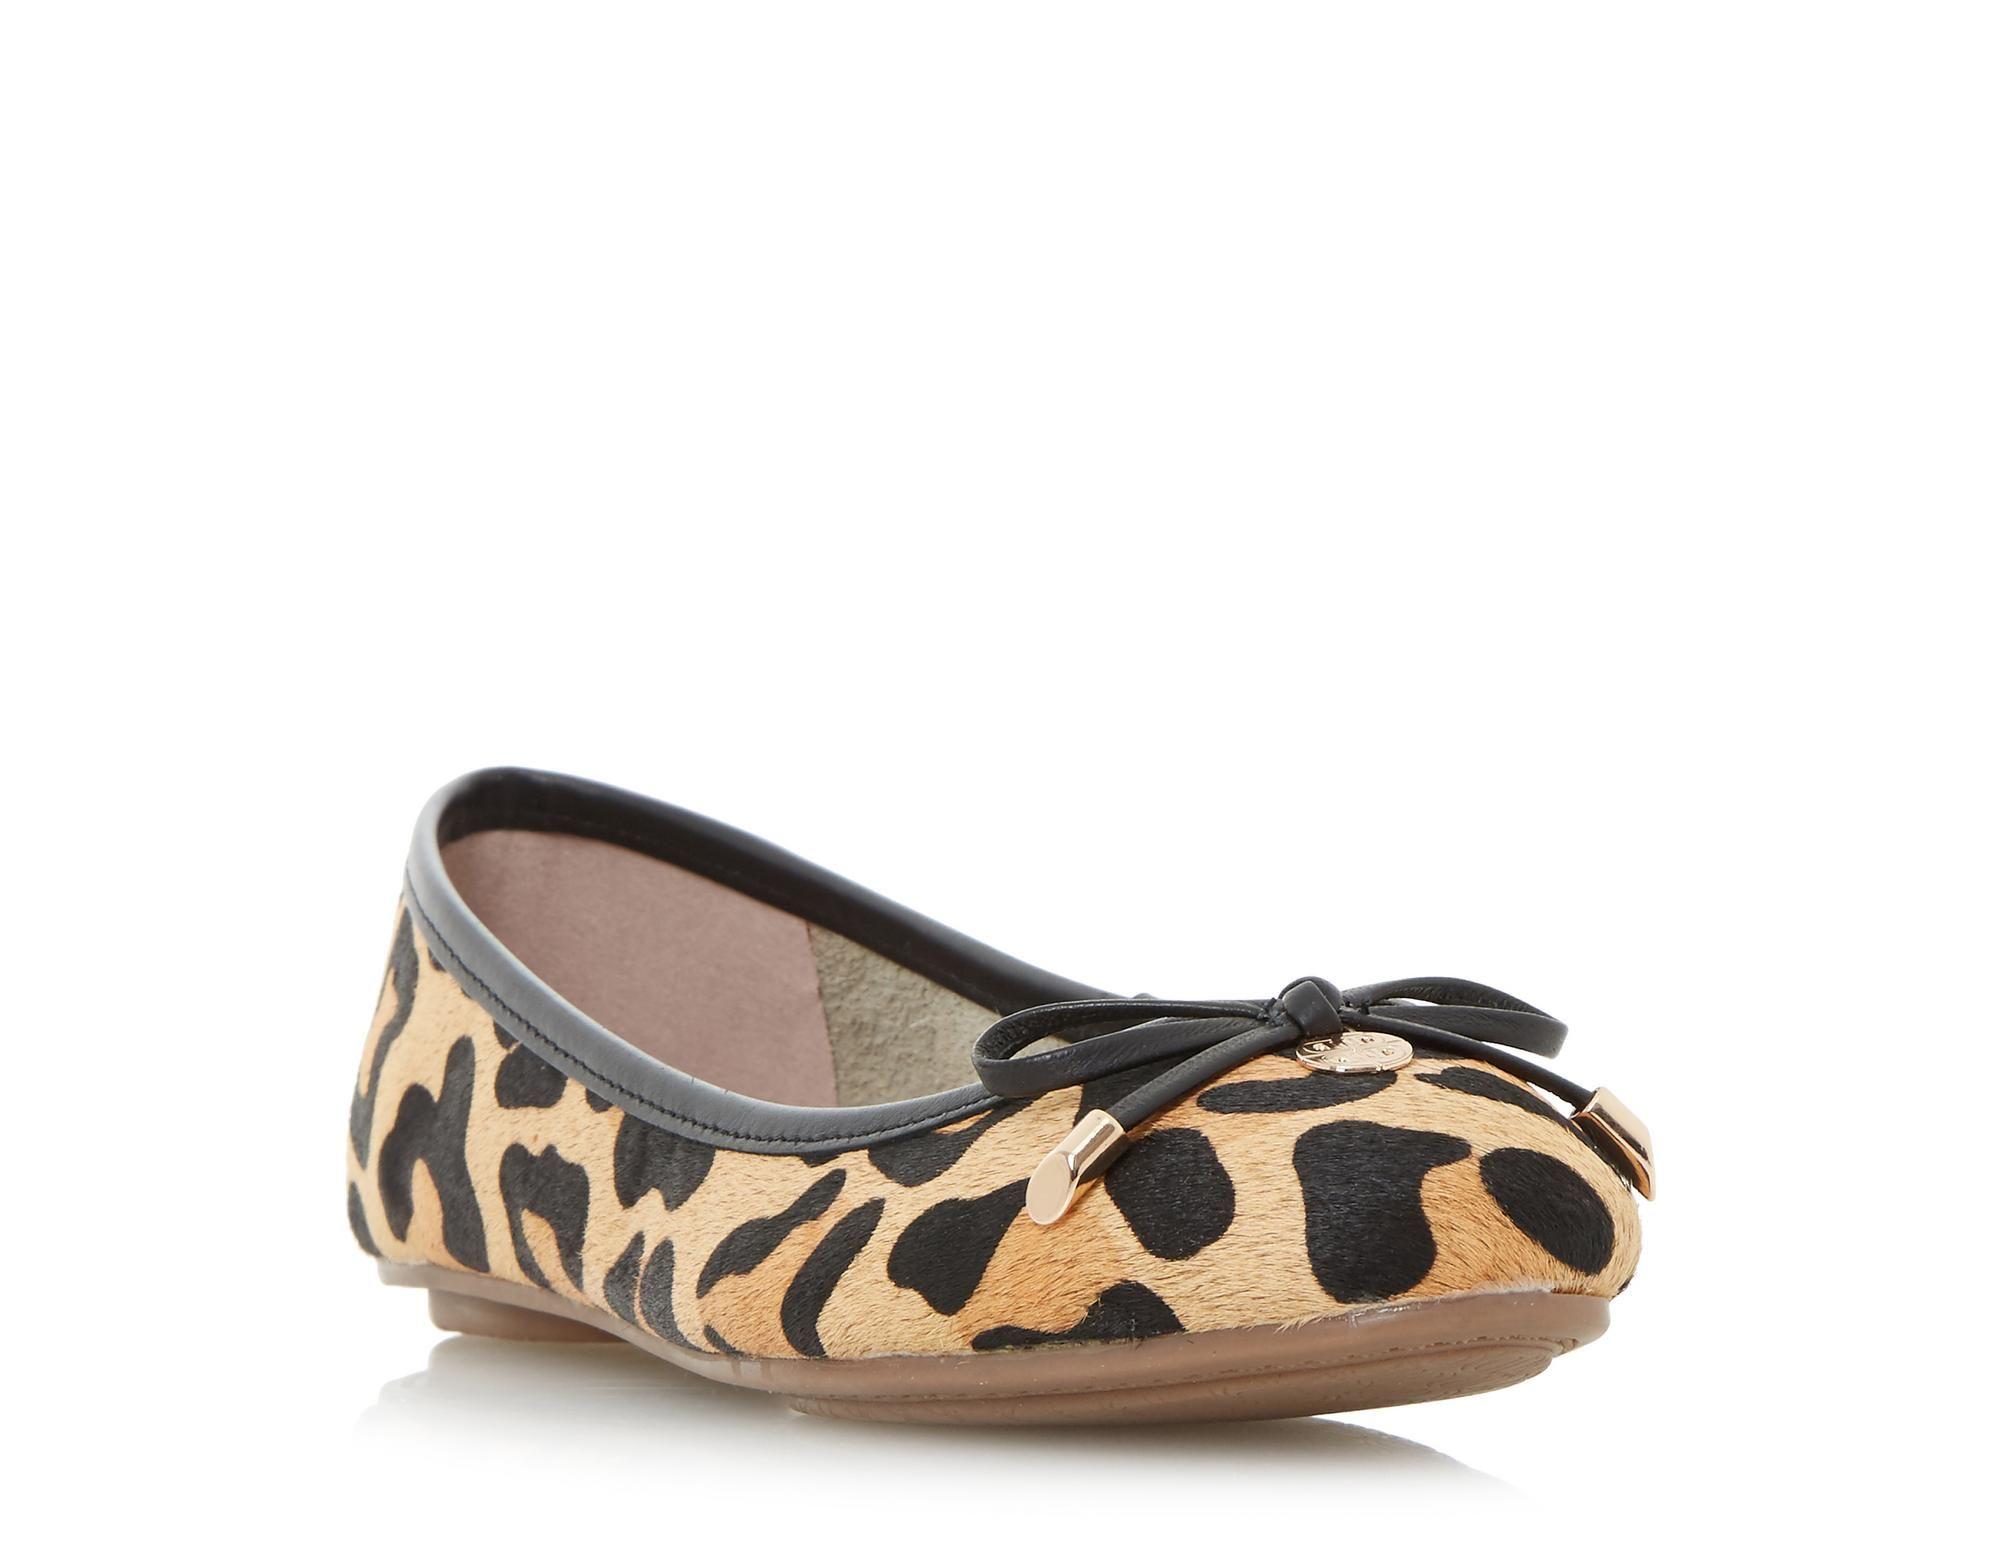 Hype is a timeless ballerina shoe